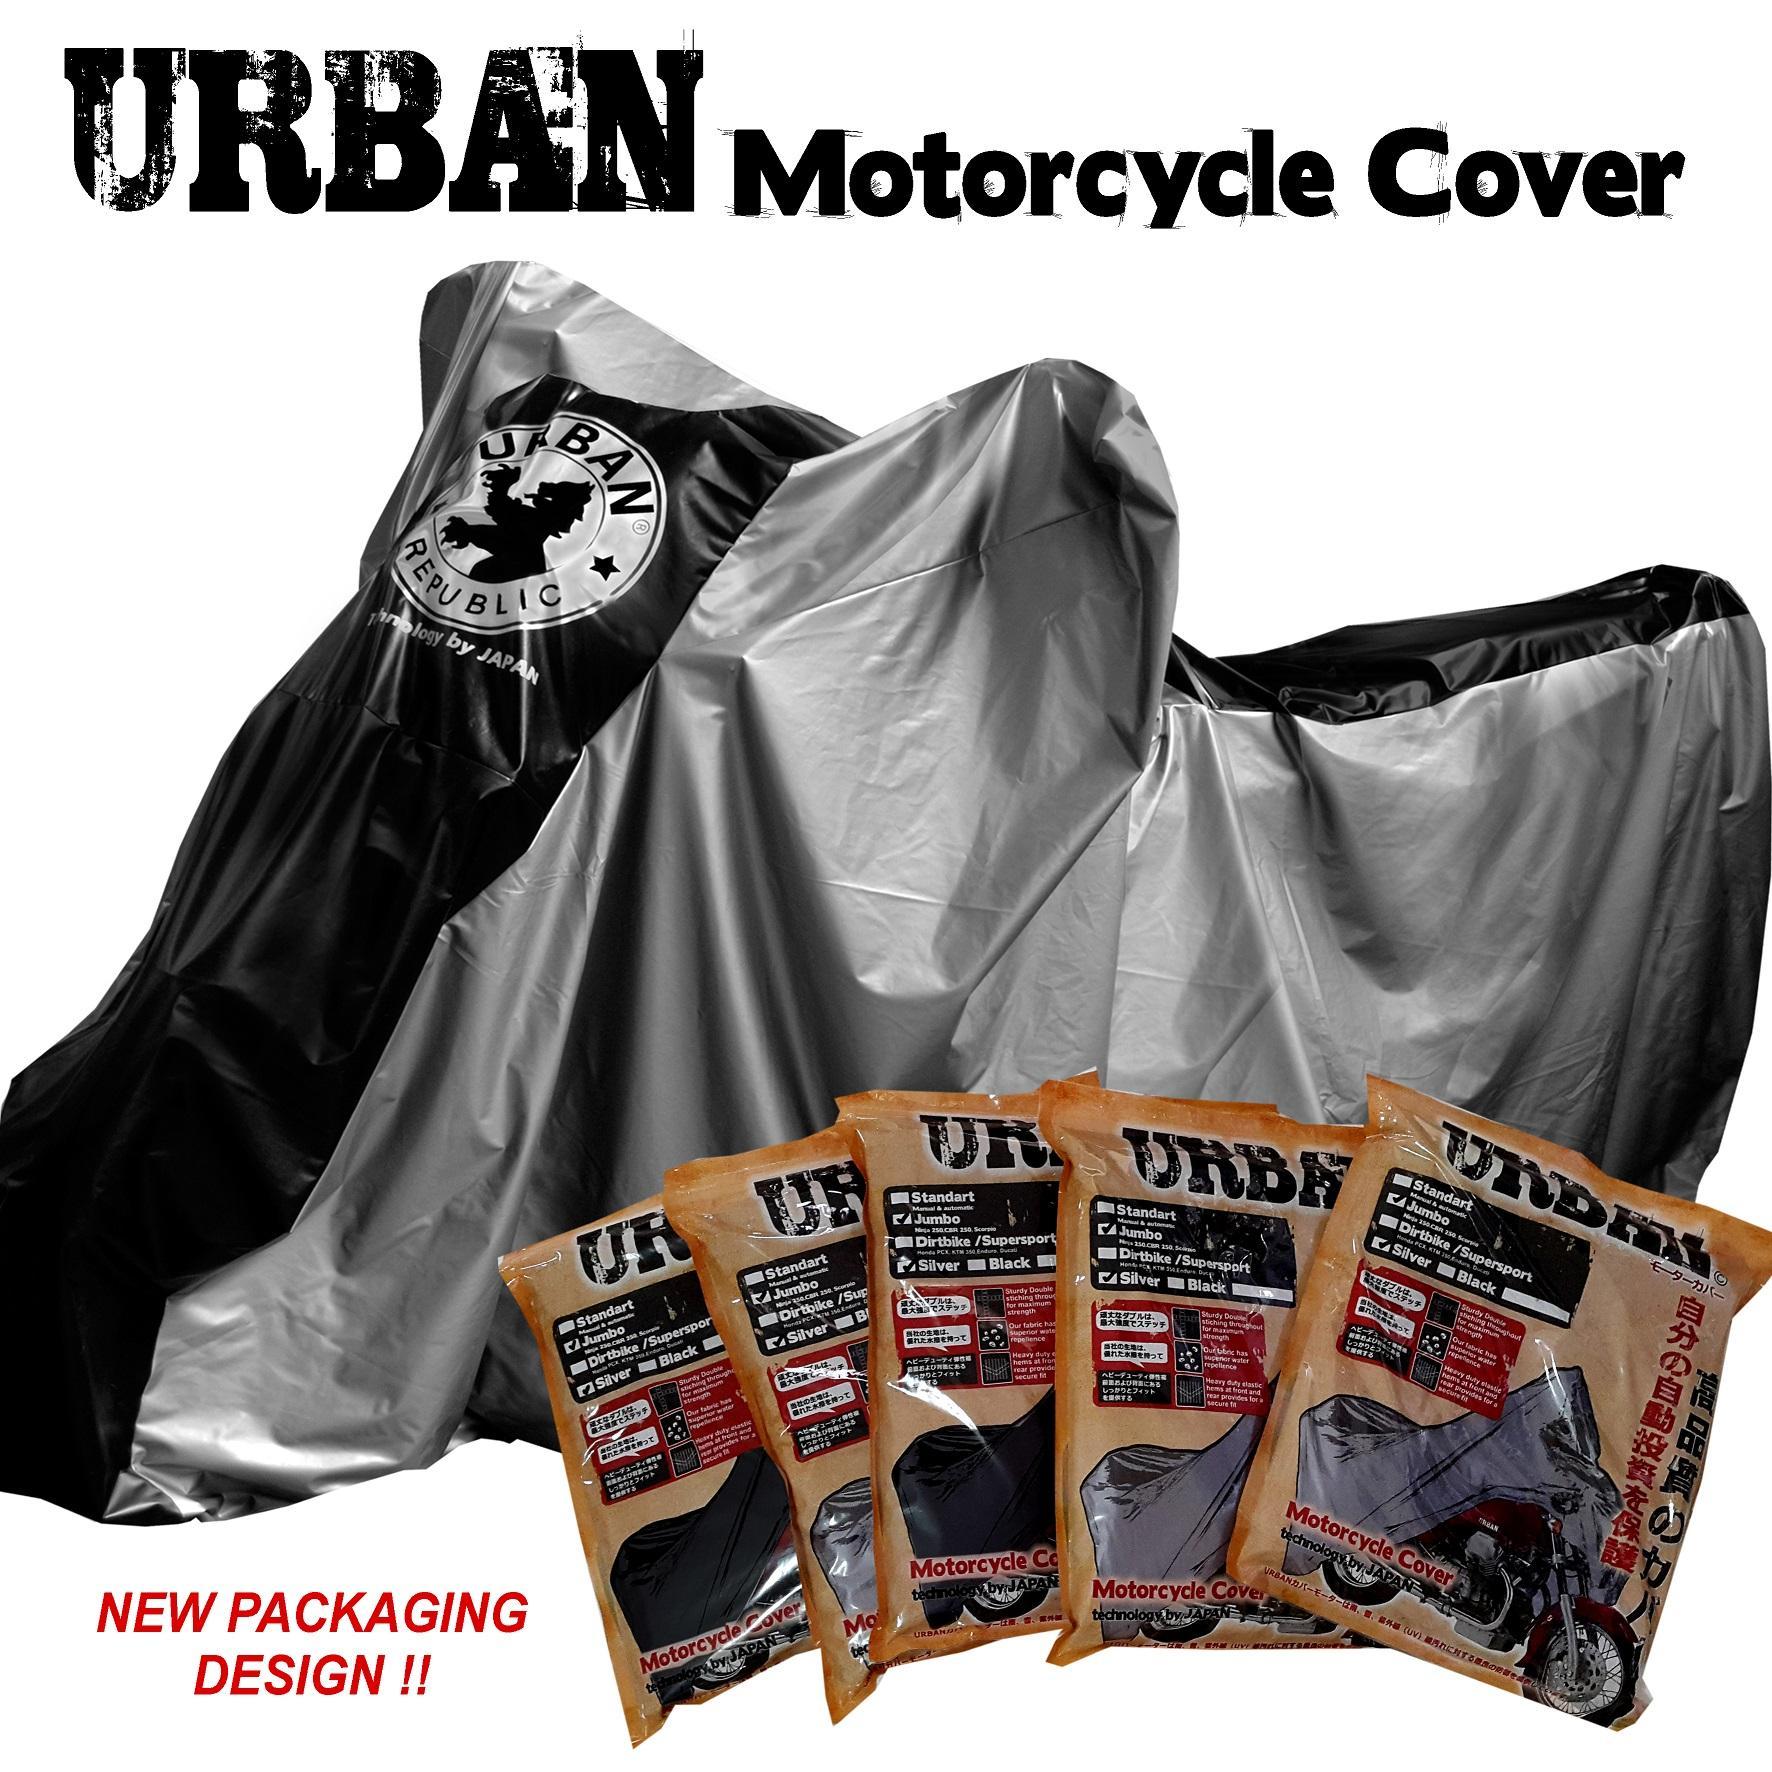 Urban Cover Sarung Motor Bebek / Sarung Cover Motor Matic Ukuran Small Mio, Scoopy, Vario, Supra, Satria Fu, Yamaha Jupiter By Cassie Store.